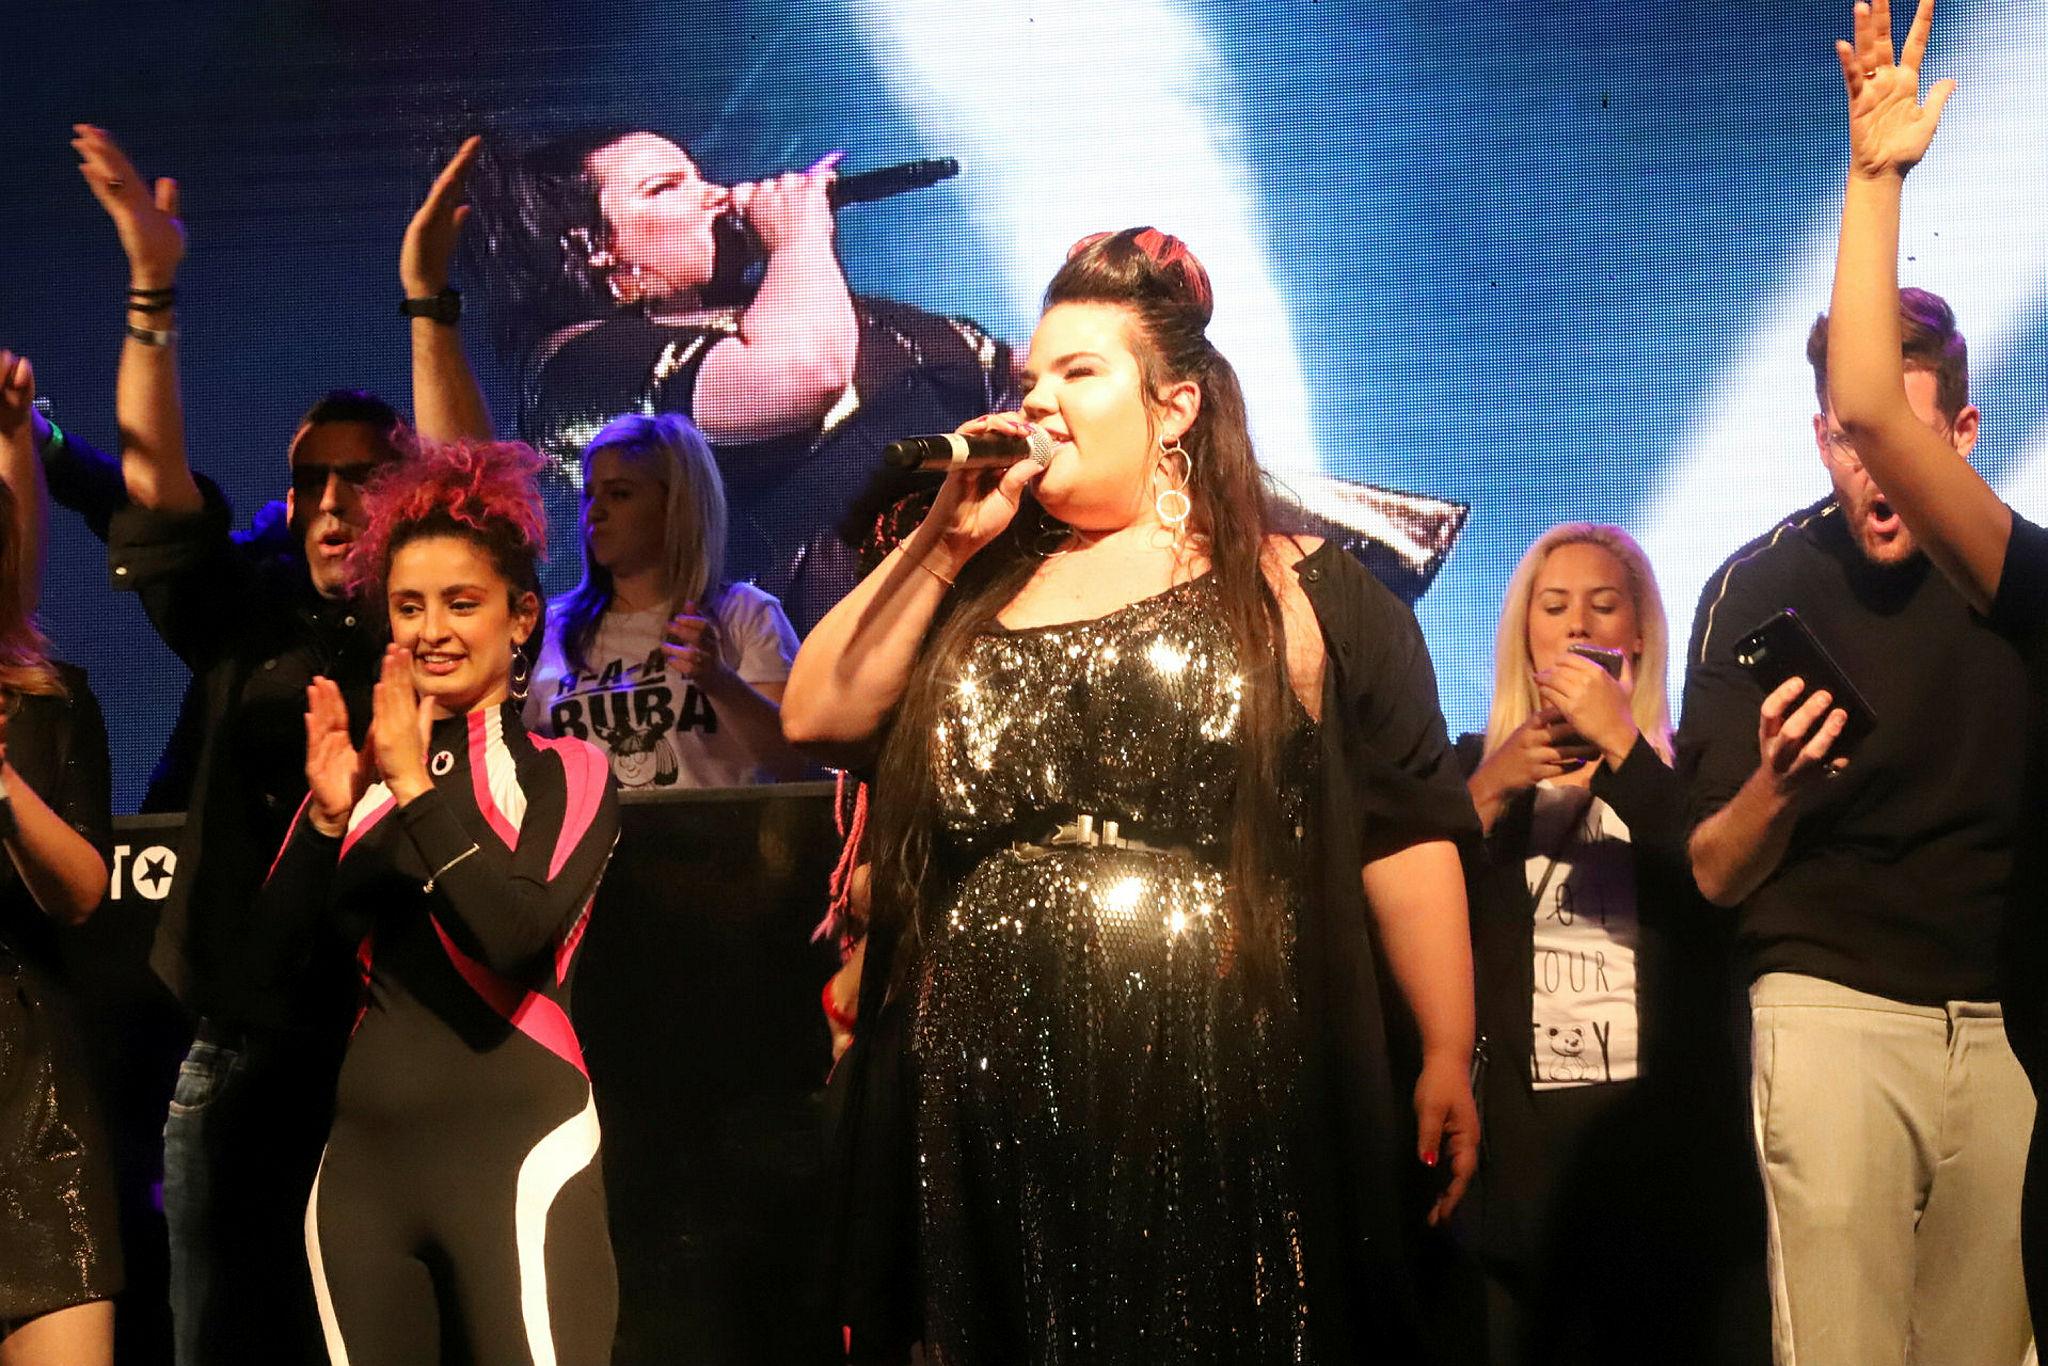 Netta Barzilai, the winner of the 2018 Eurovision Song Contest